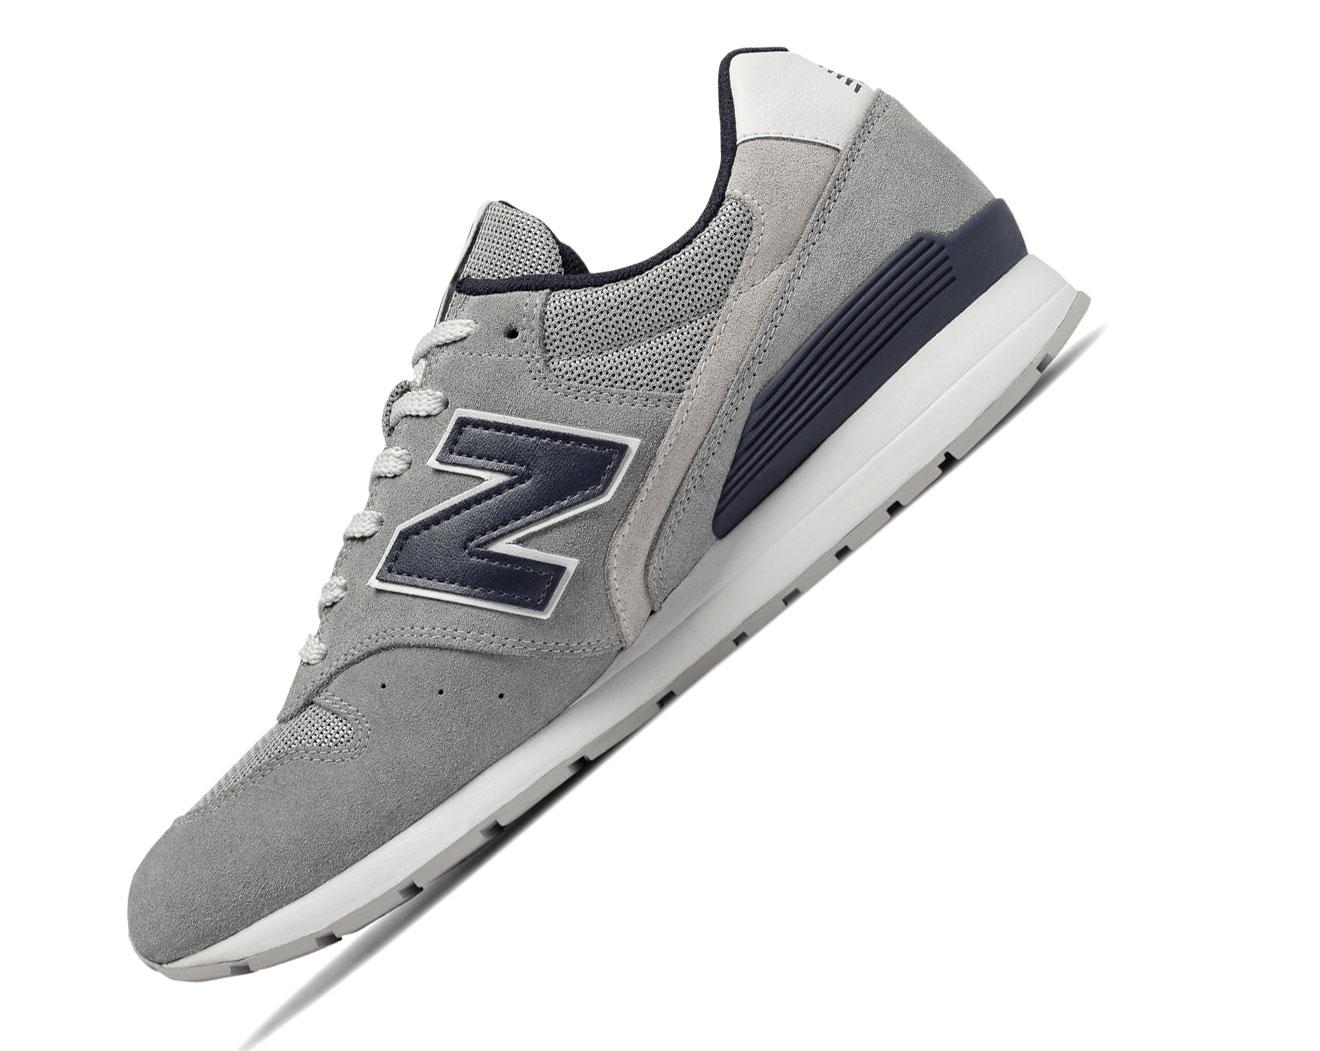 Schuhe Balance Mrl996wg Retro Grau 996 Classics Sneaker Herren New doWrCxeB